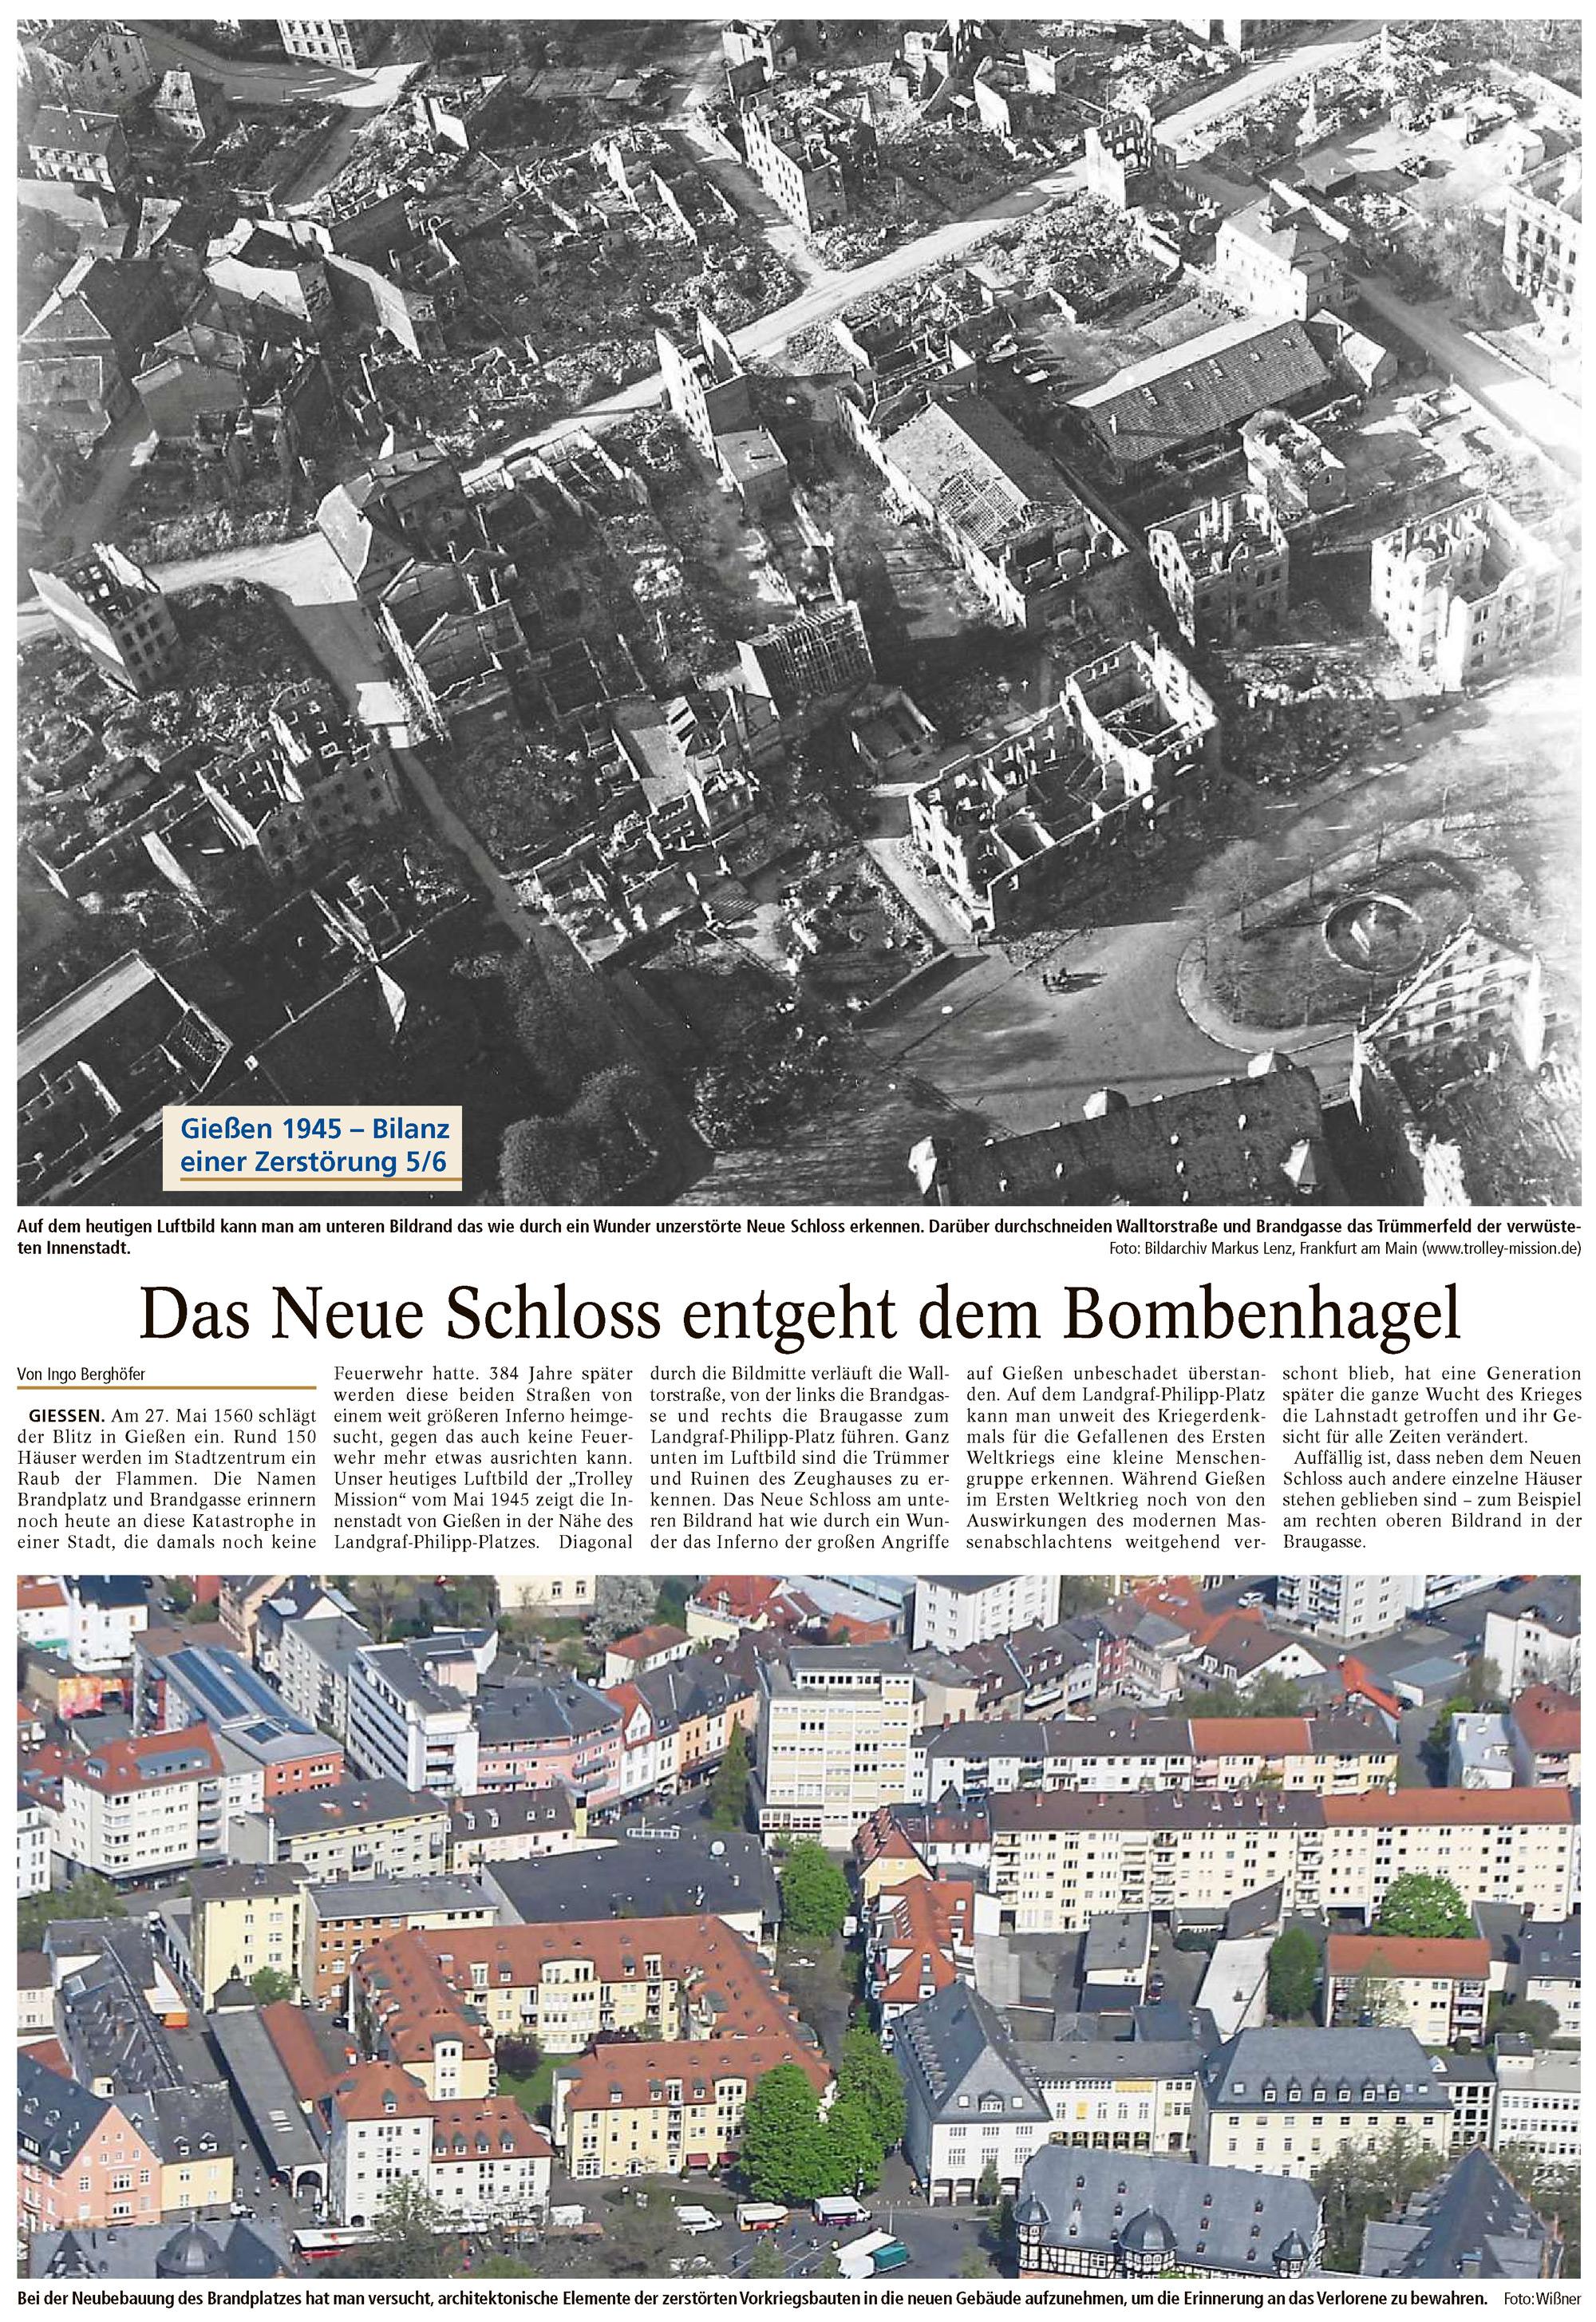 Gießener Anzeiger: Das neue Schloss entgeht dem Bombenhagel